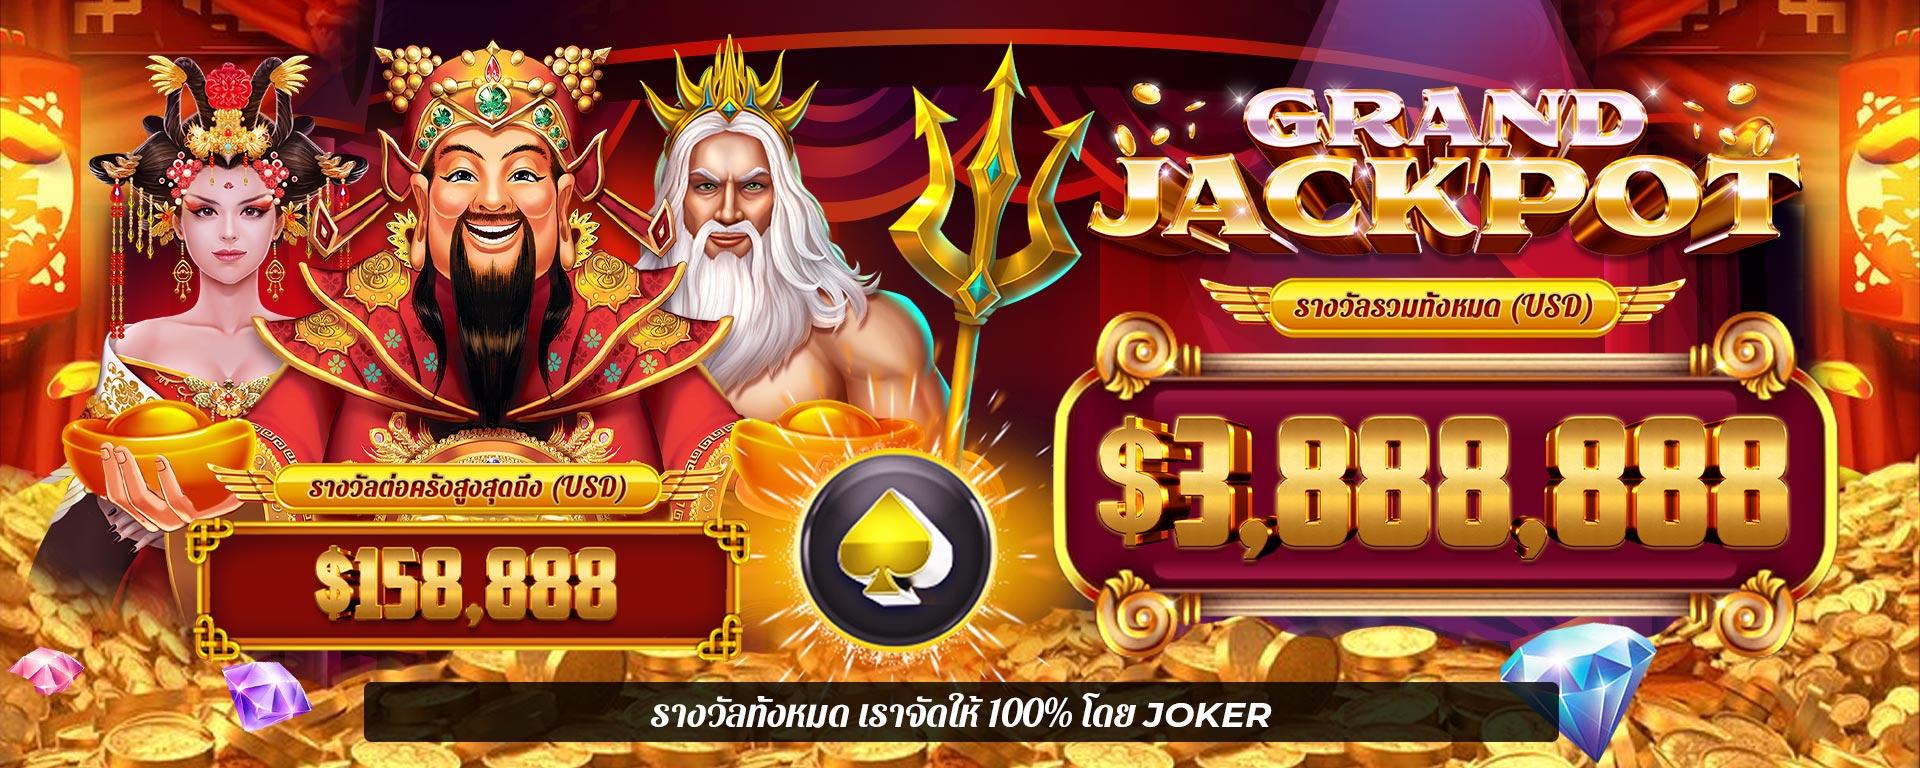 banner-grand-jackpot-202104-th